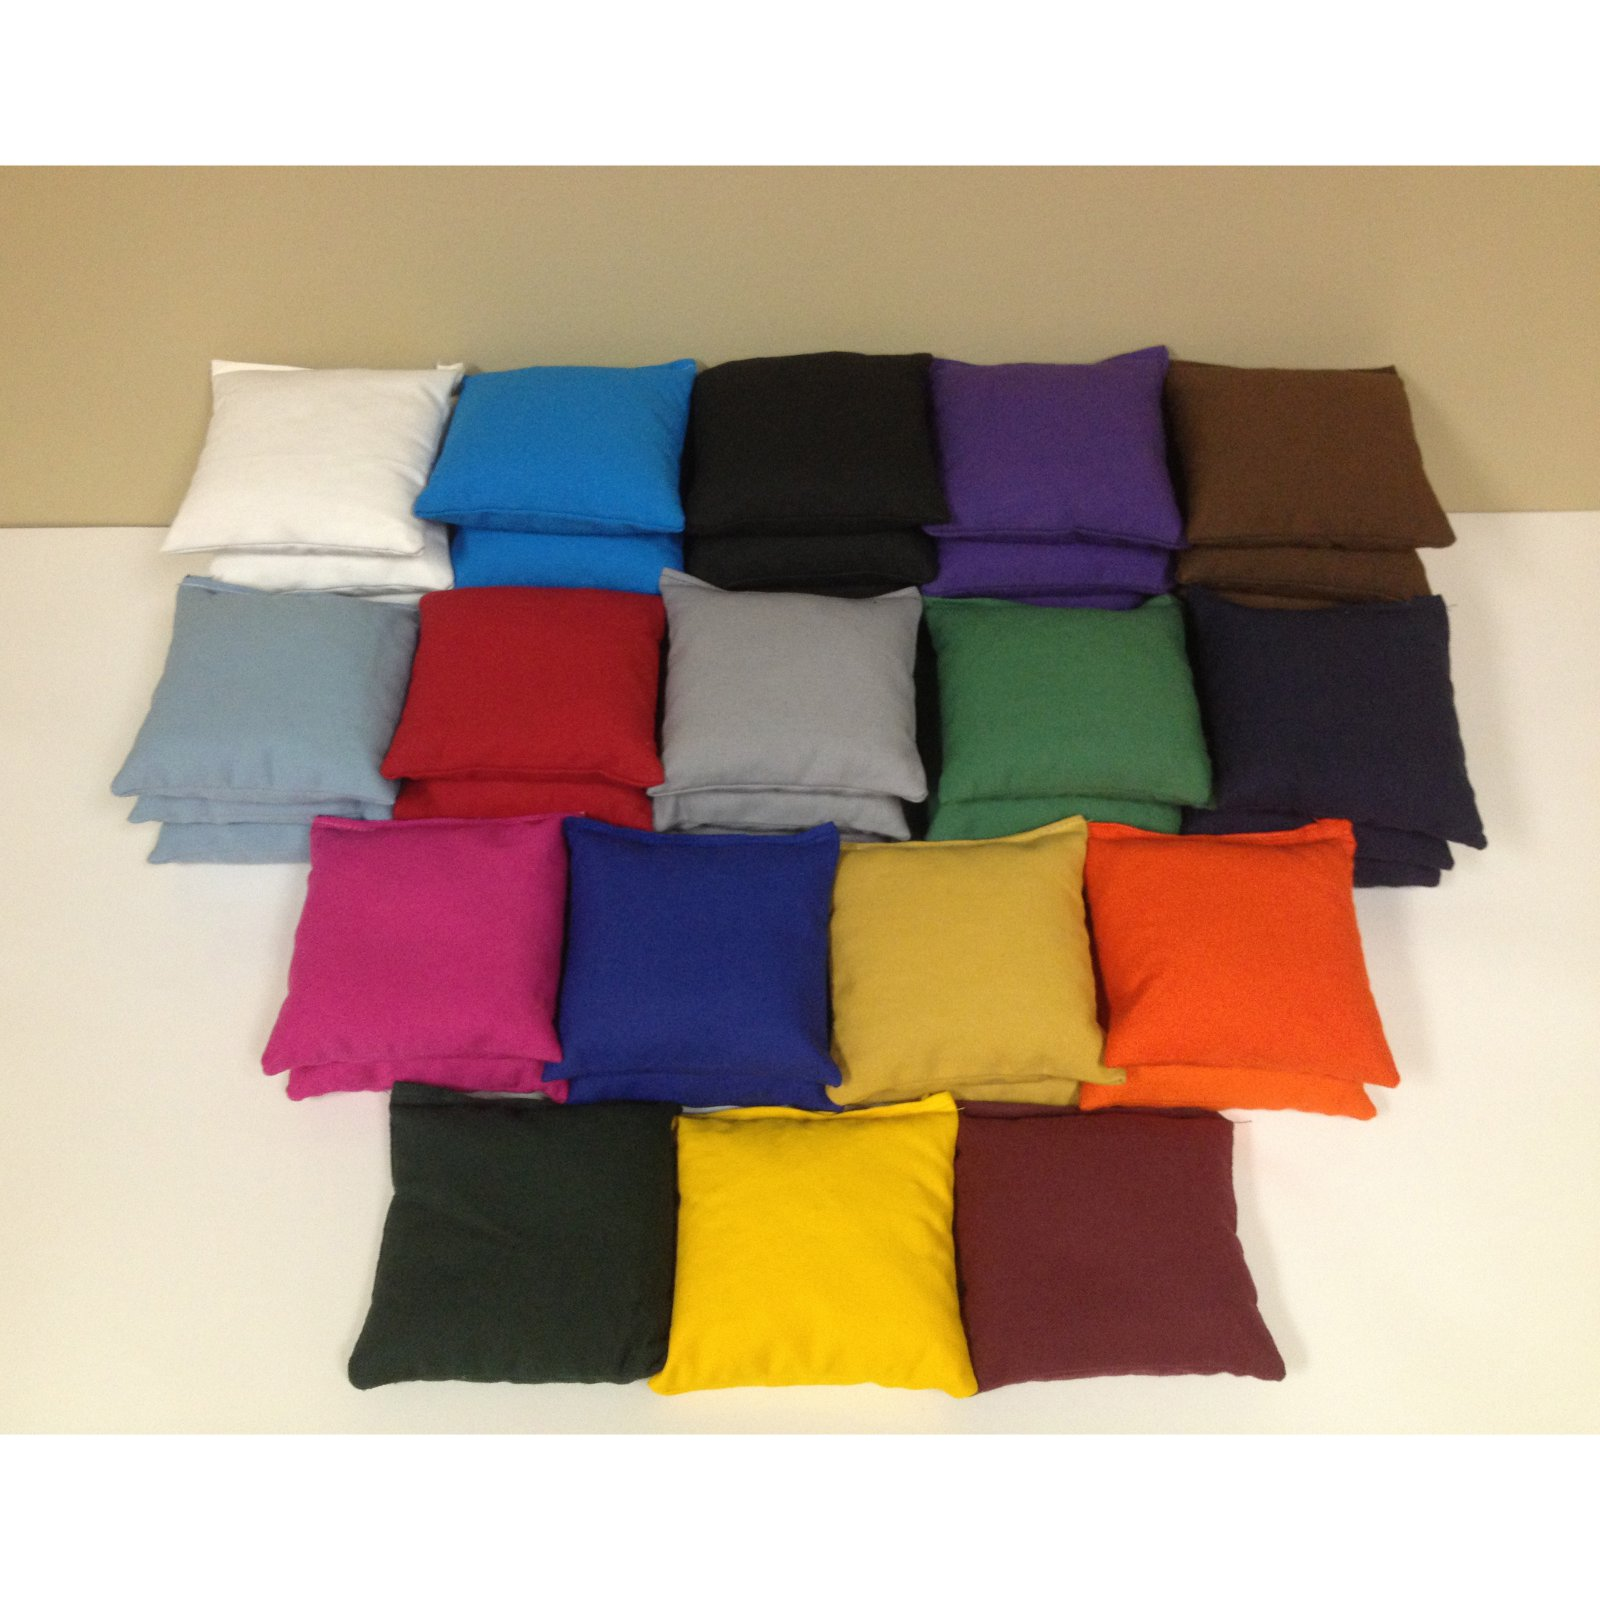 Tournament Cornhole Bags Set of 8 by AJJ Cornhole